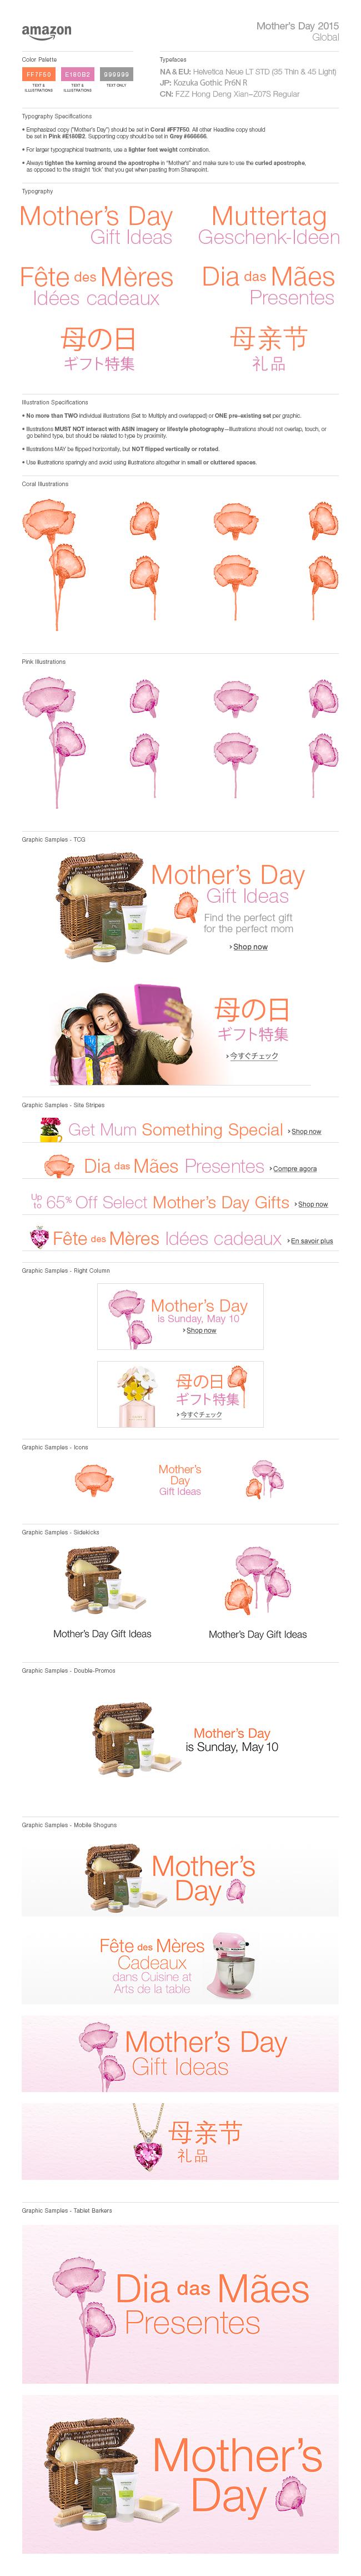 2015_mothers-day_styleguide.jpg